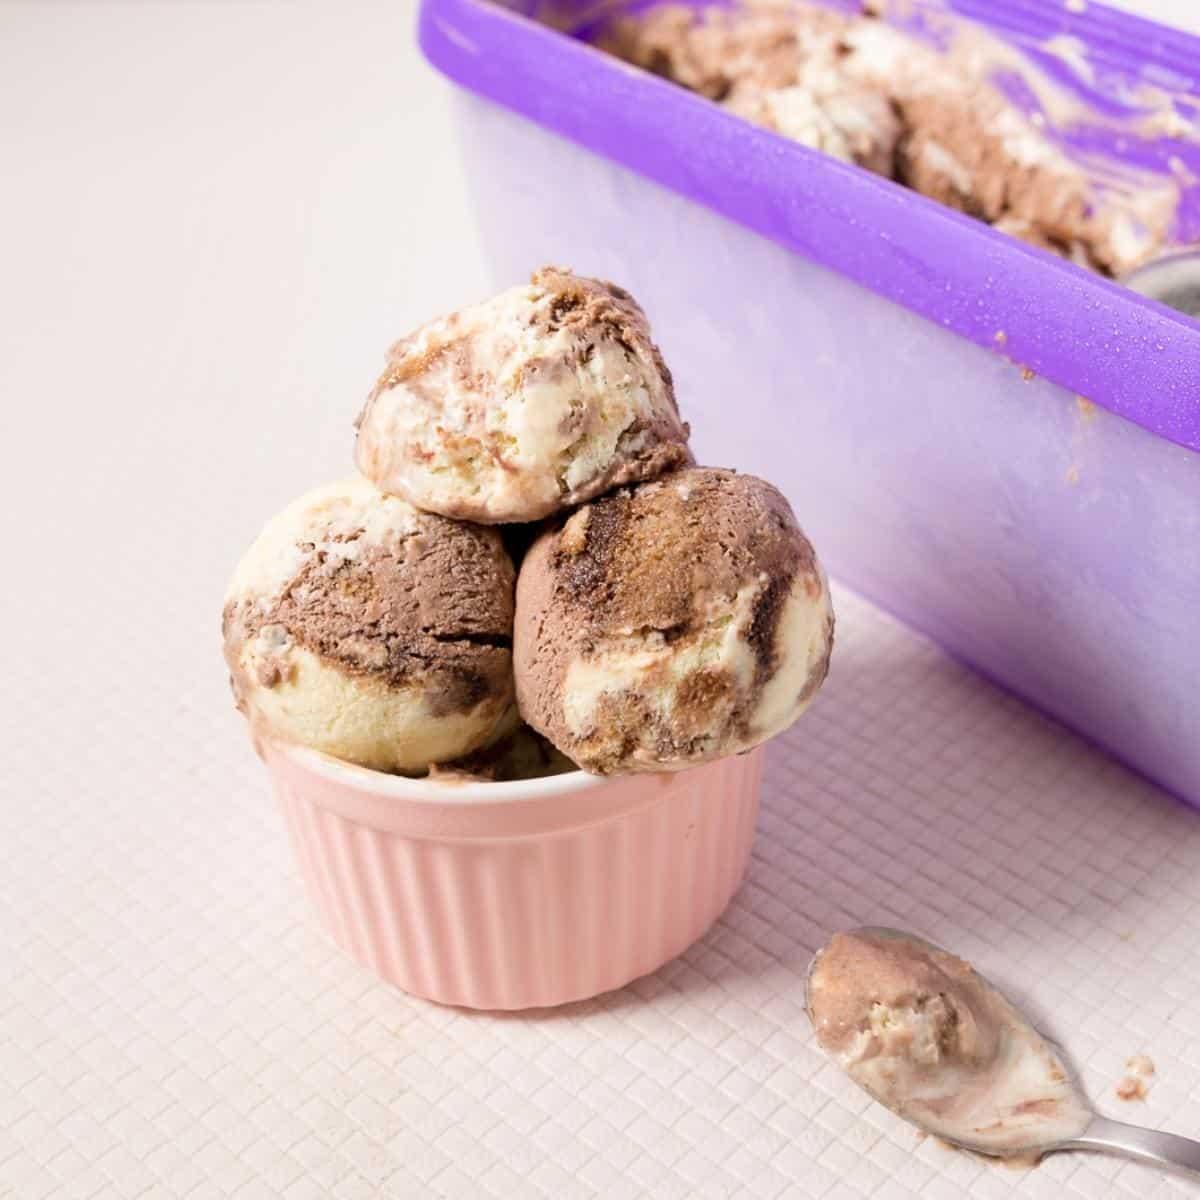 Ramekin with scoops of tiramisu ice cream.